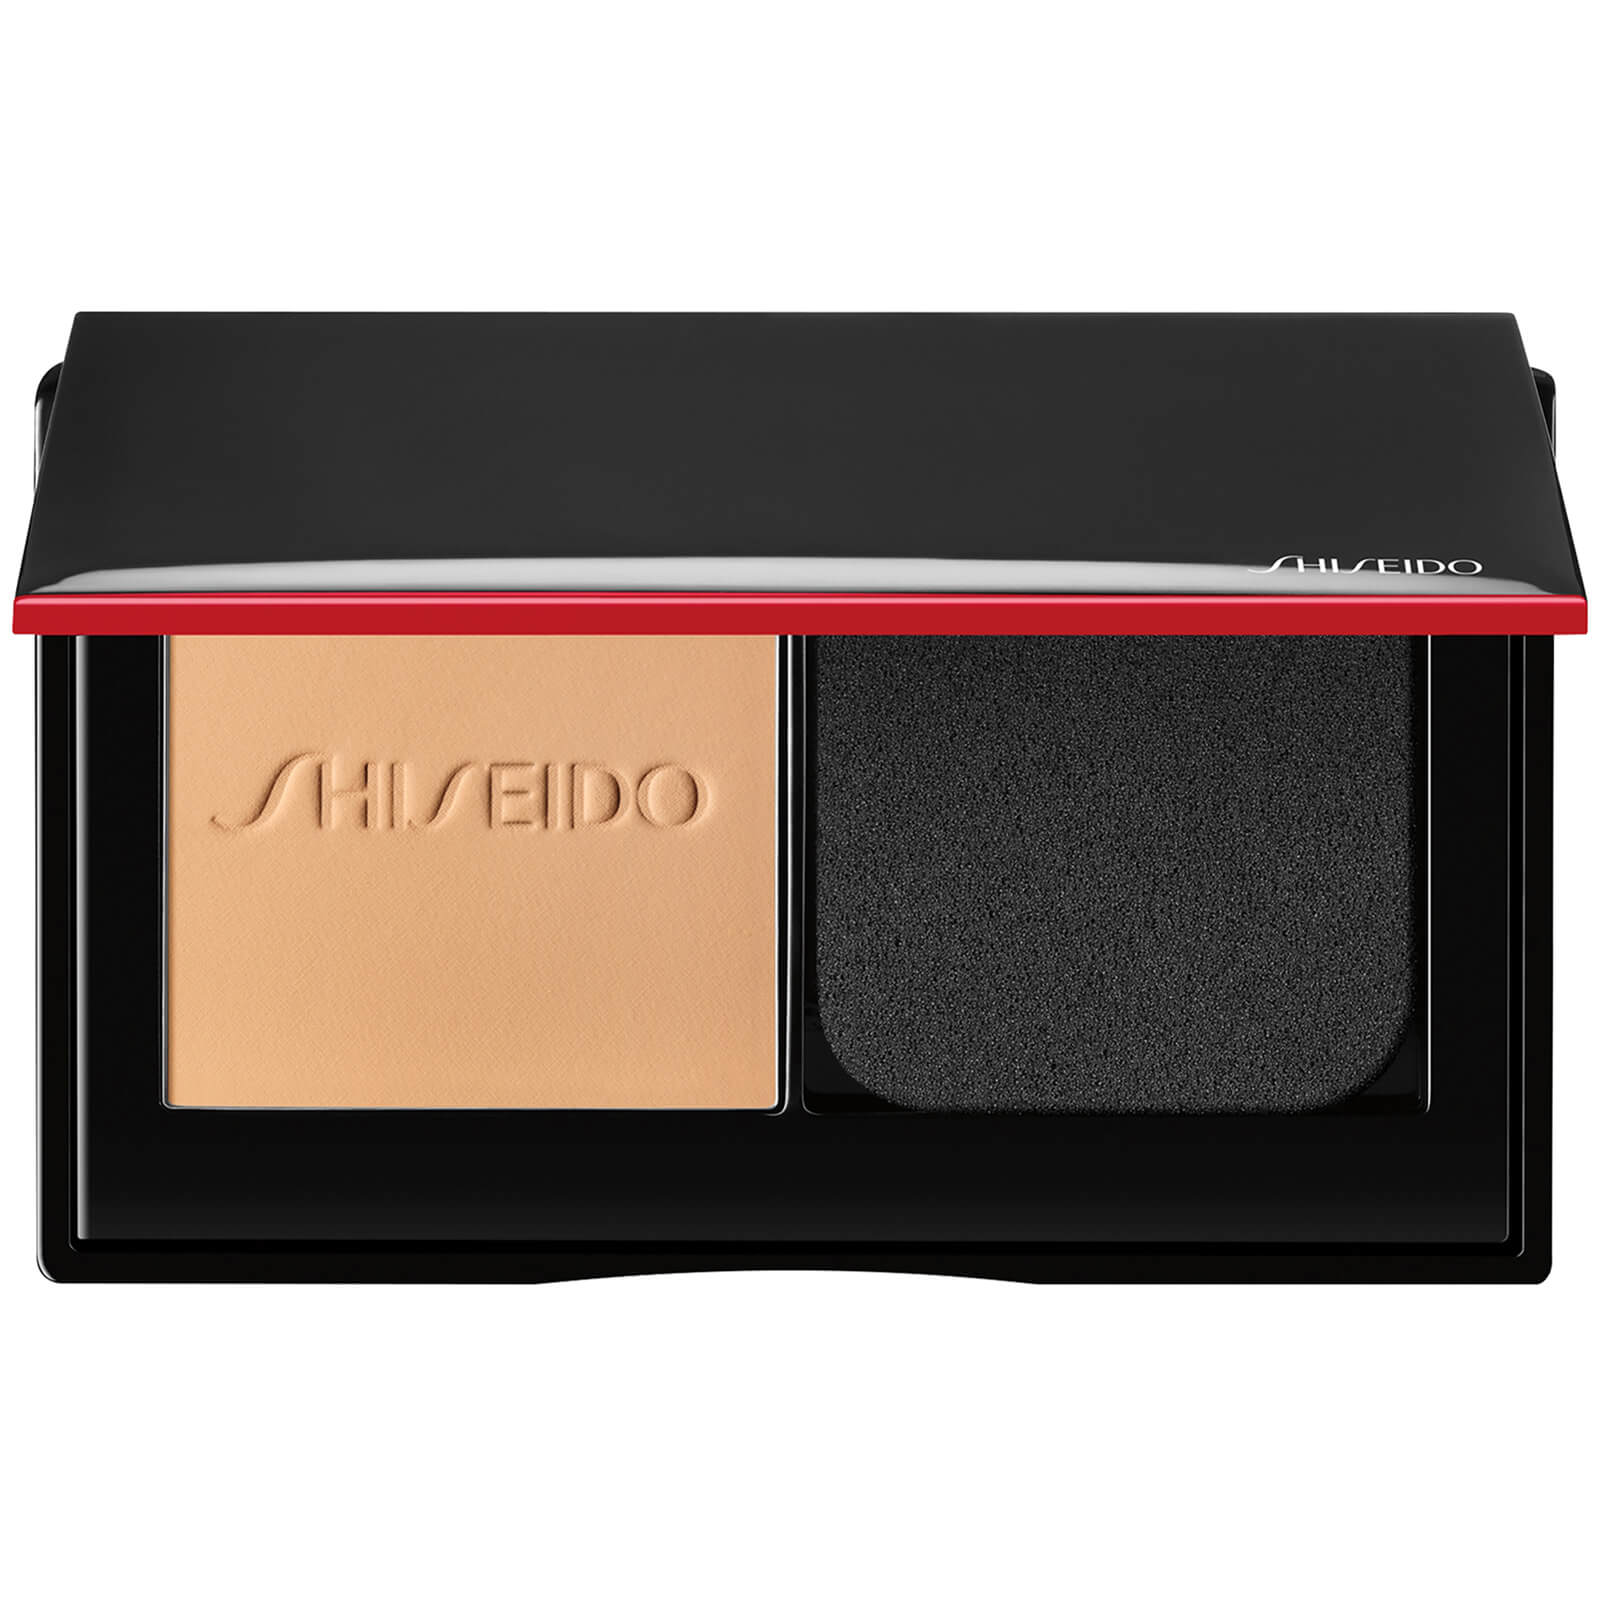 Shiseido Synchro Skin Self-Refreshing Custom Finish Powder Foundation 9g (Various Shades) - Shell